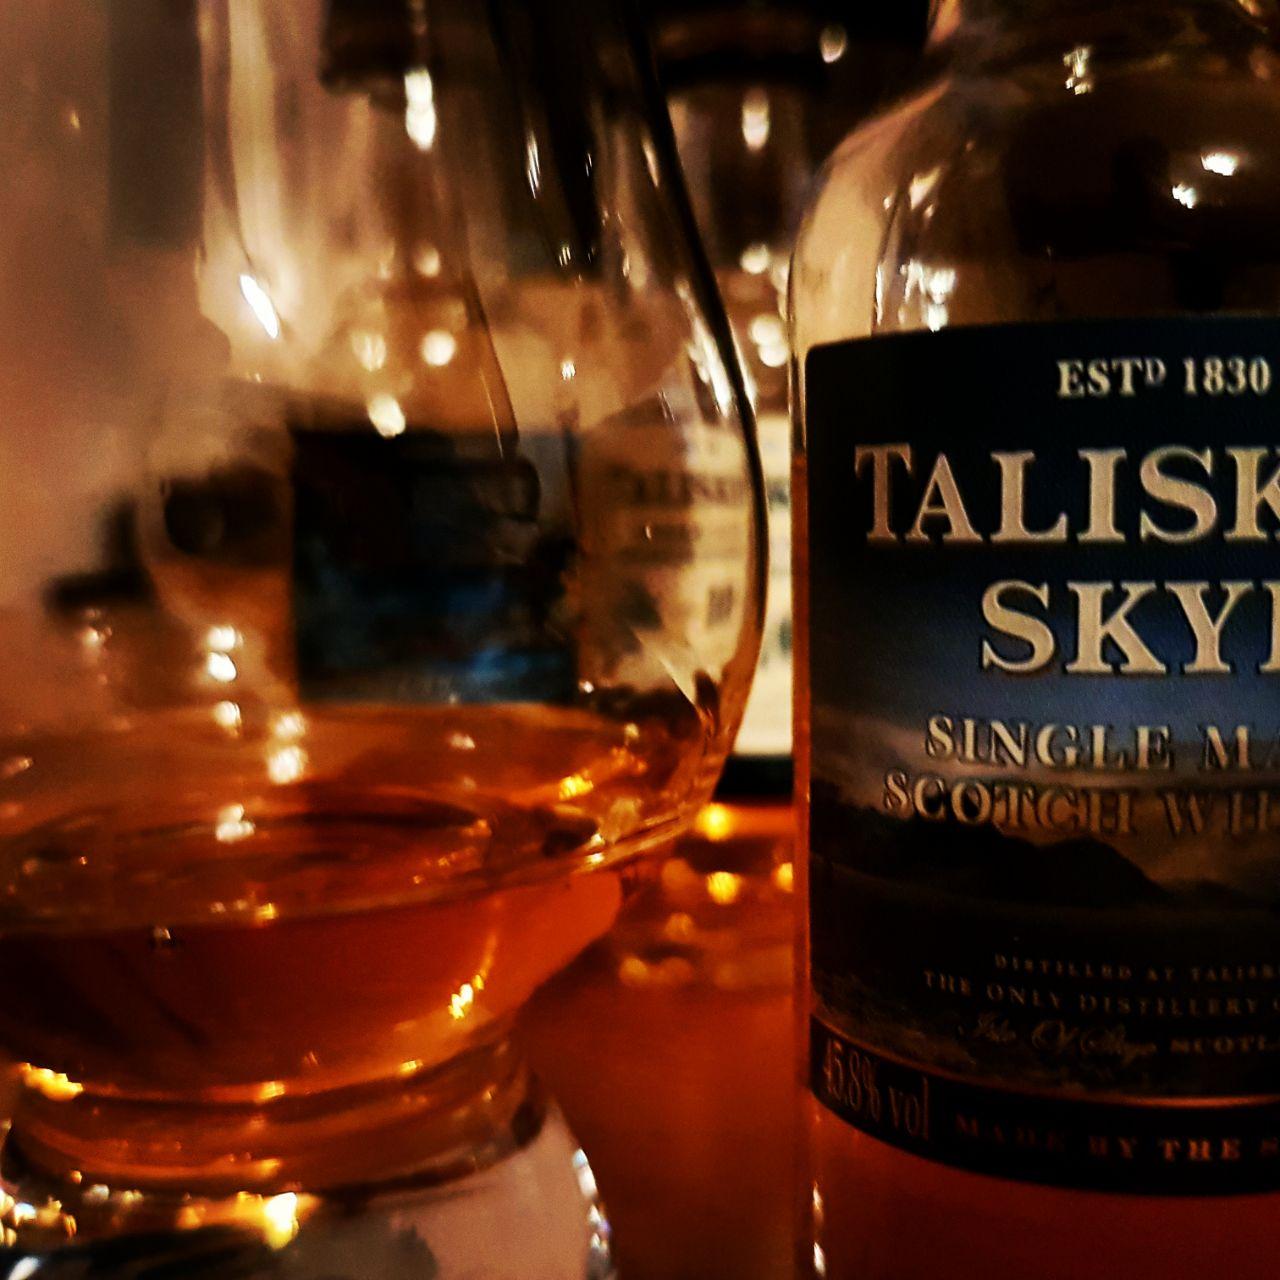 Talisker Skye Islay Single Malt Scotch Whisky